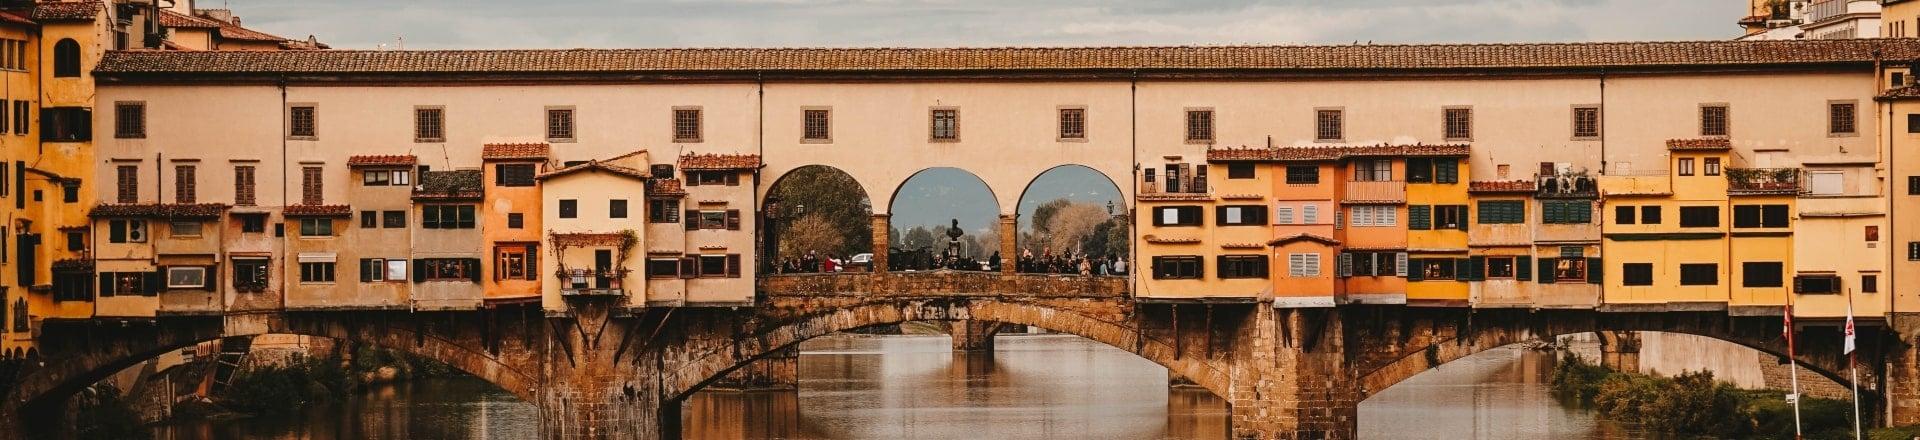 Ponte Vecchio Experience